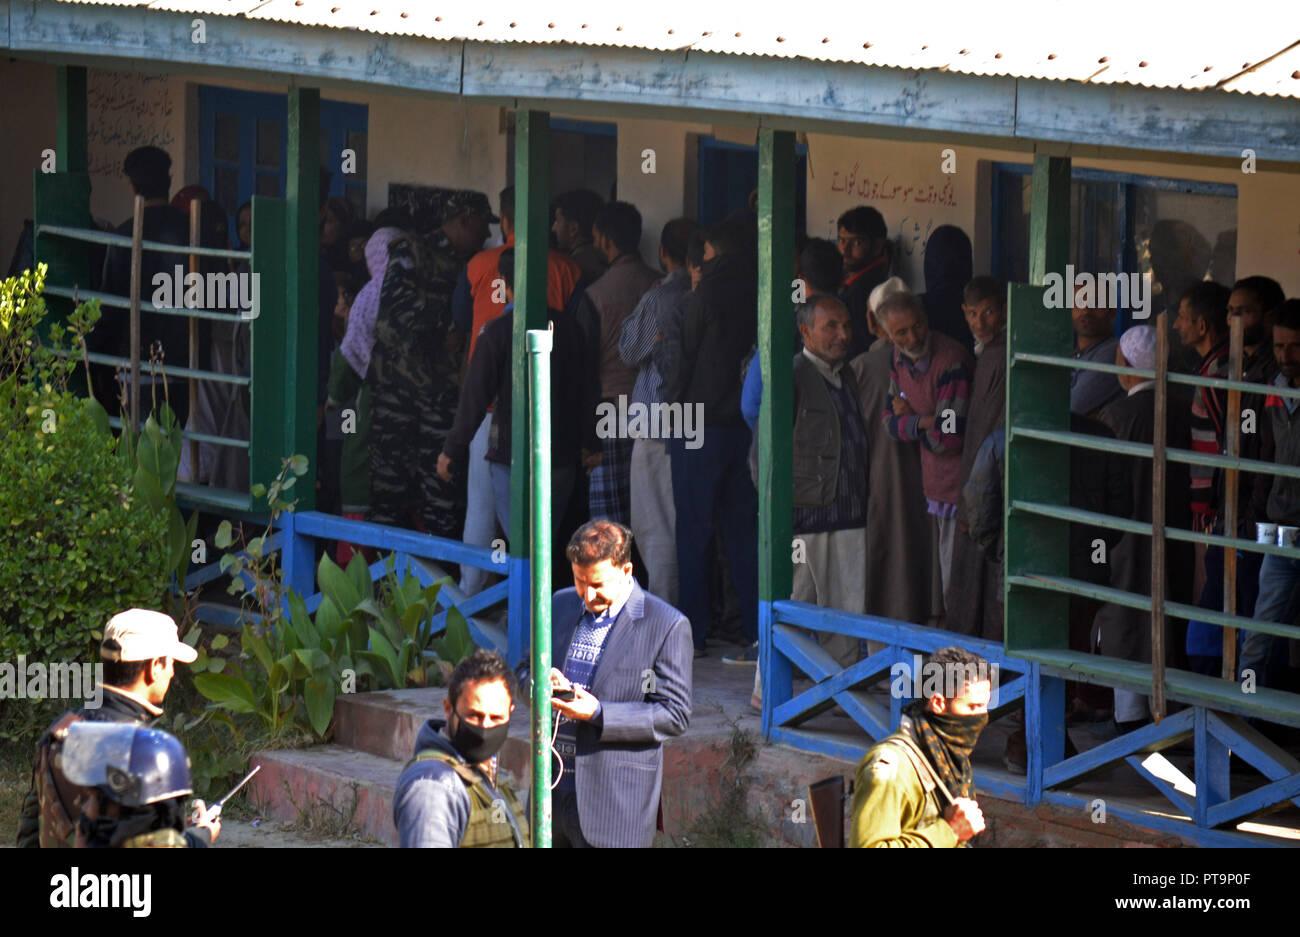 October 7, 2018 - Srinagar, Jammu and Kashmir, India - People stand